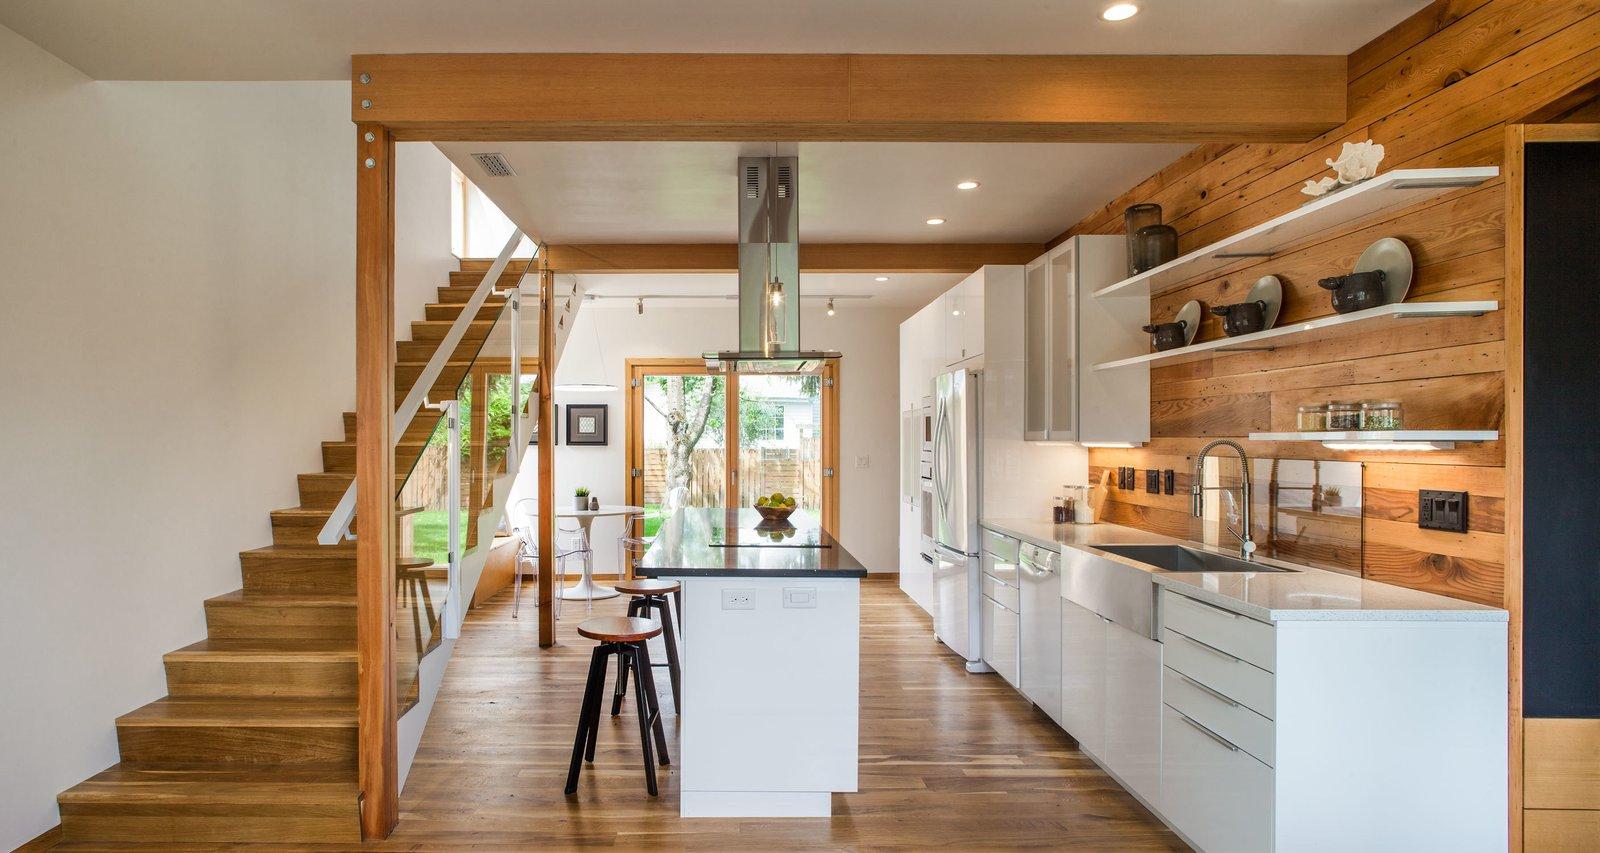 Dwell Home Tours Makes its Way to Portland - Dwell